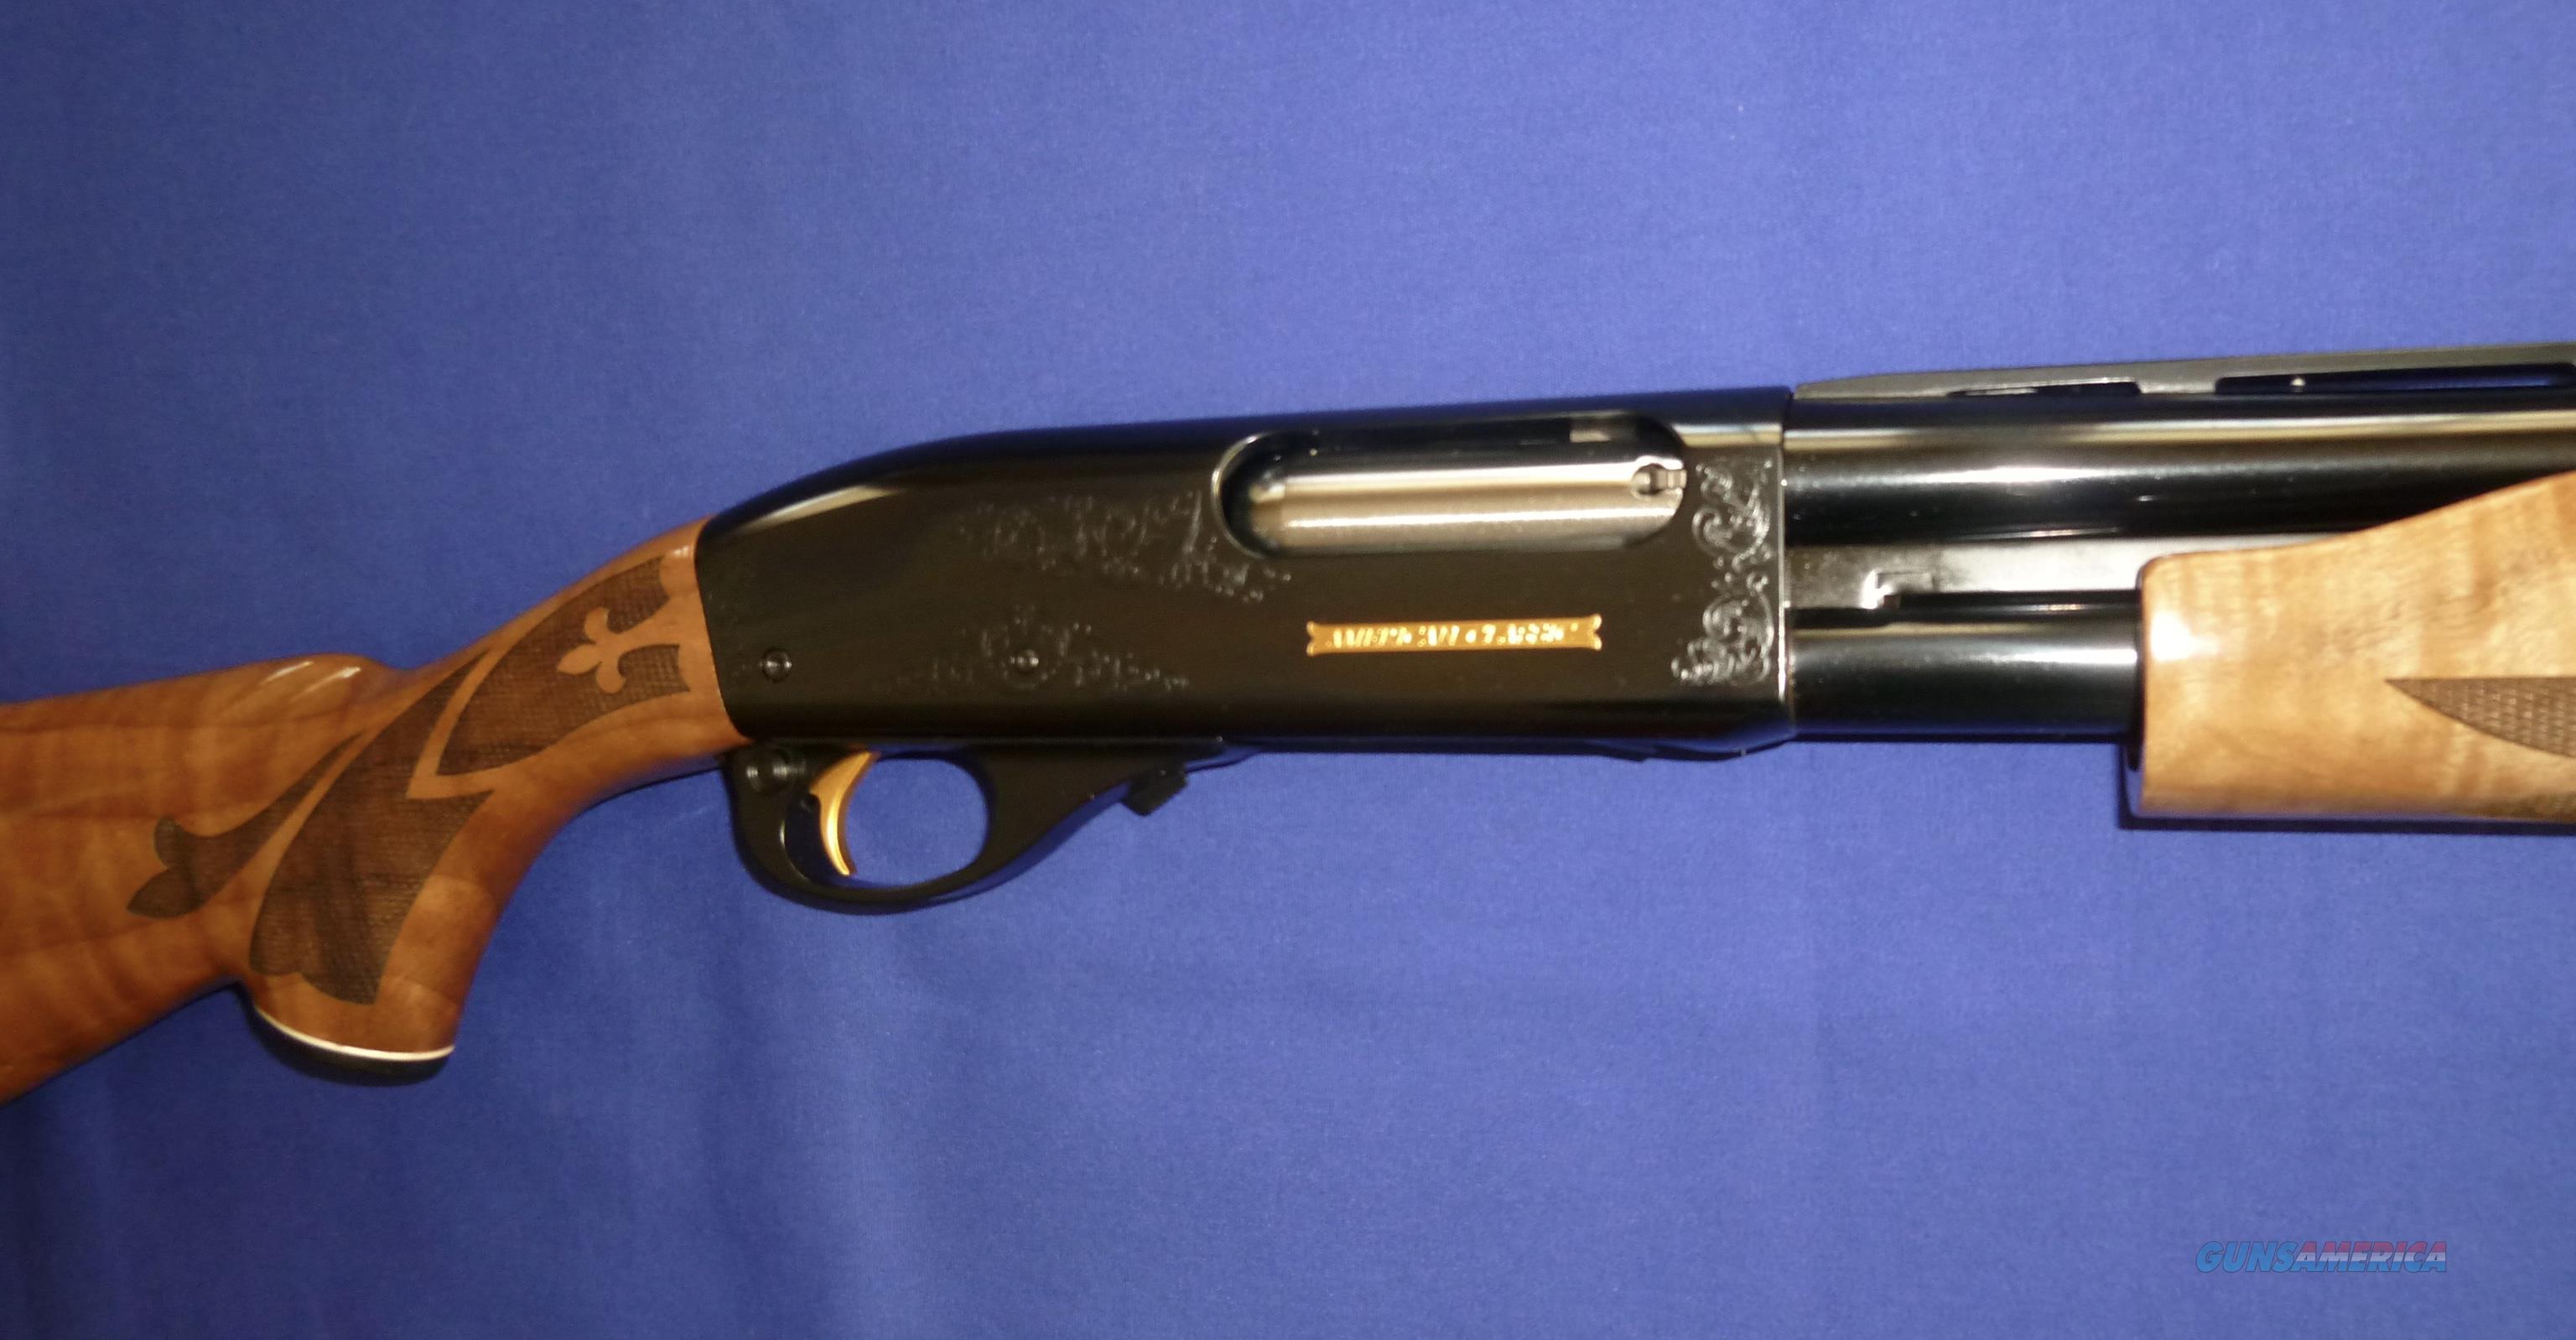 Remington 870 wingmaster american classic 20 ga for sale for Classic american